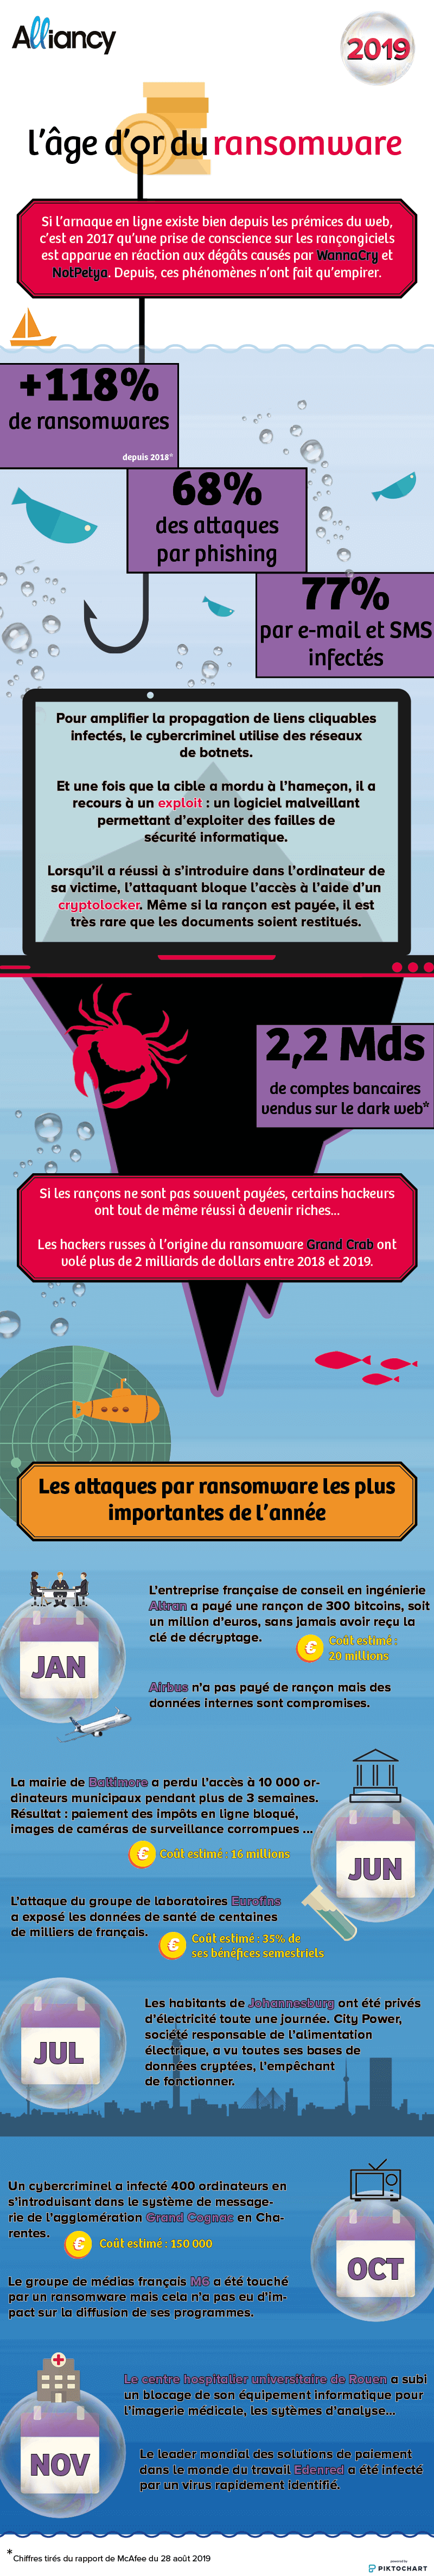 Infographie : L'âge d'or du ransomware